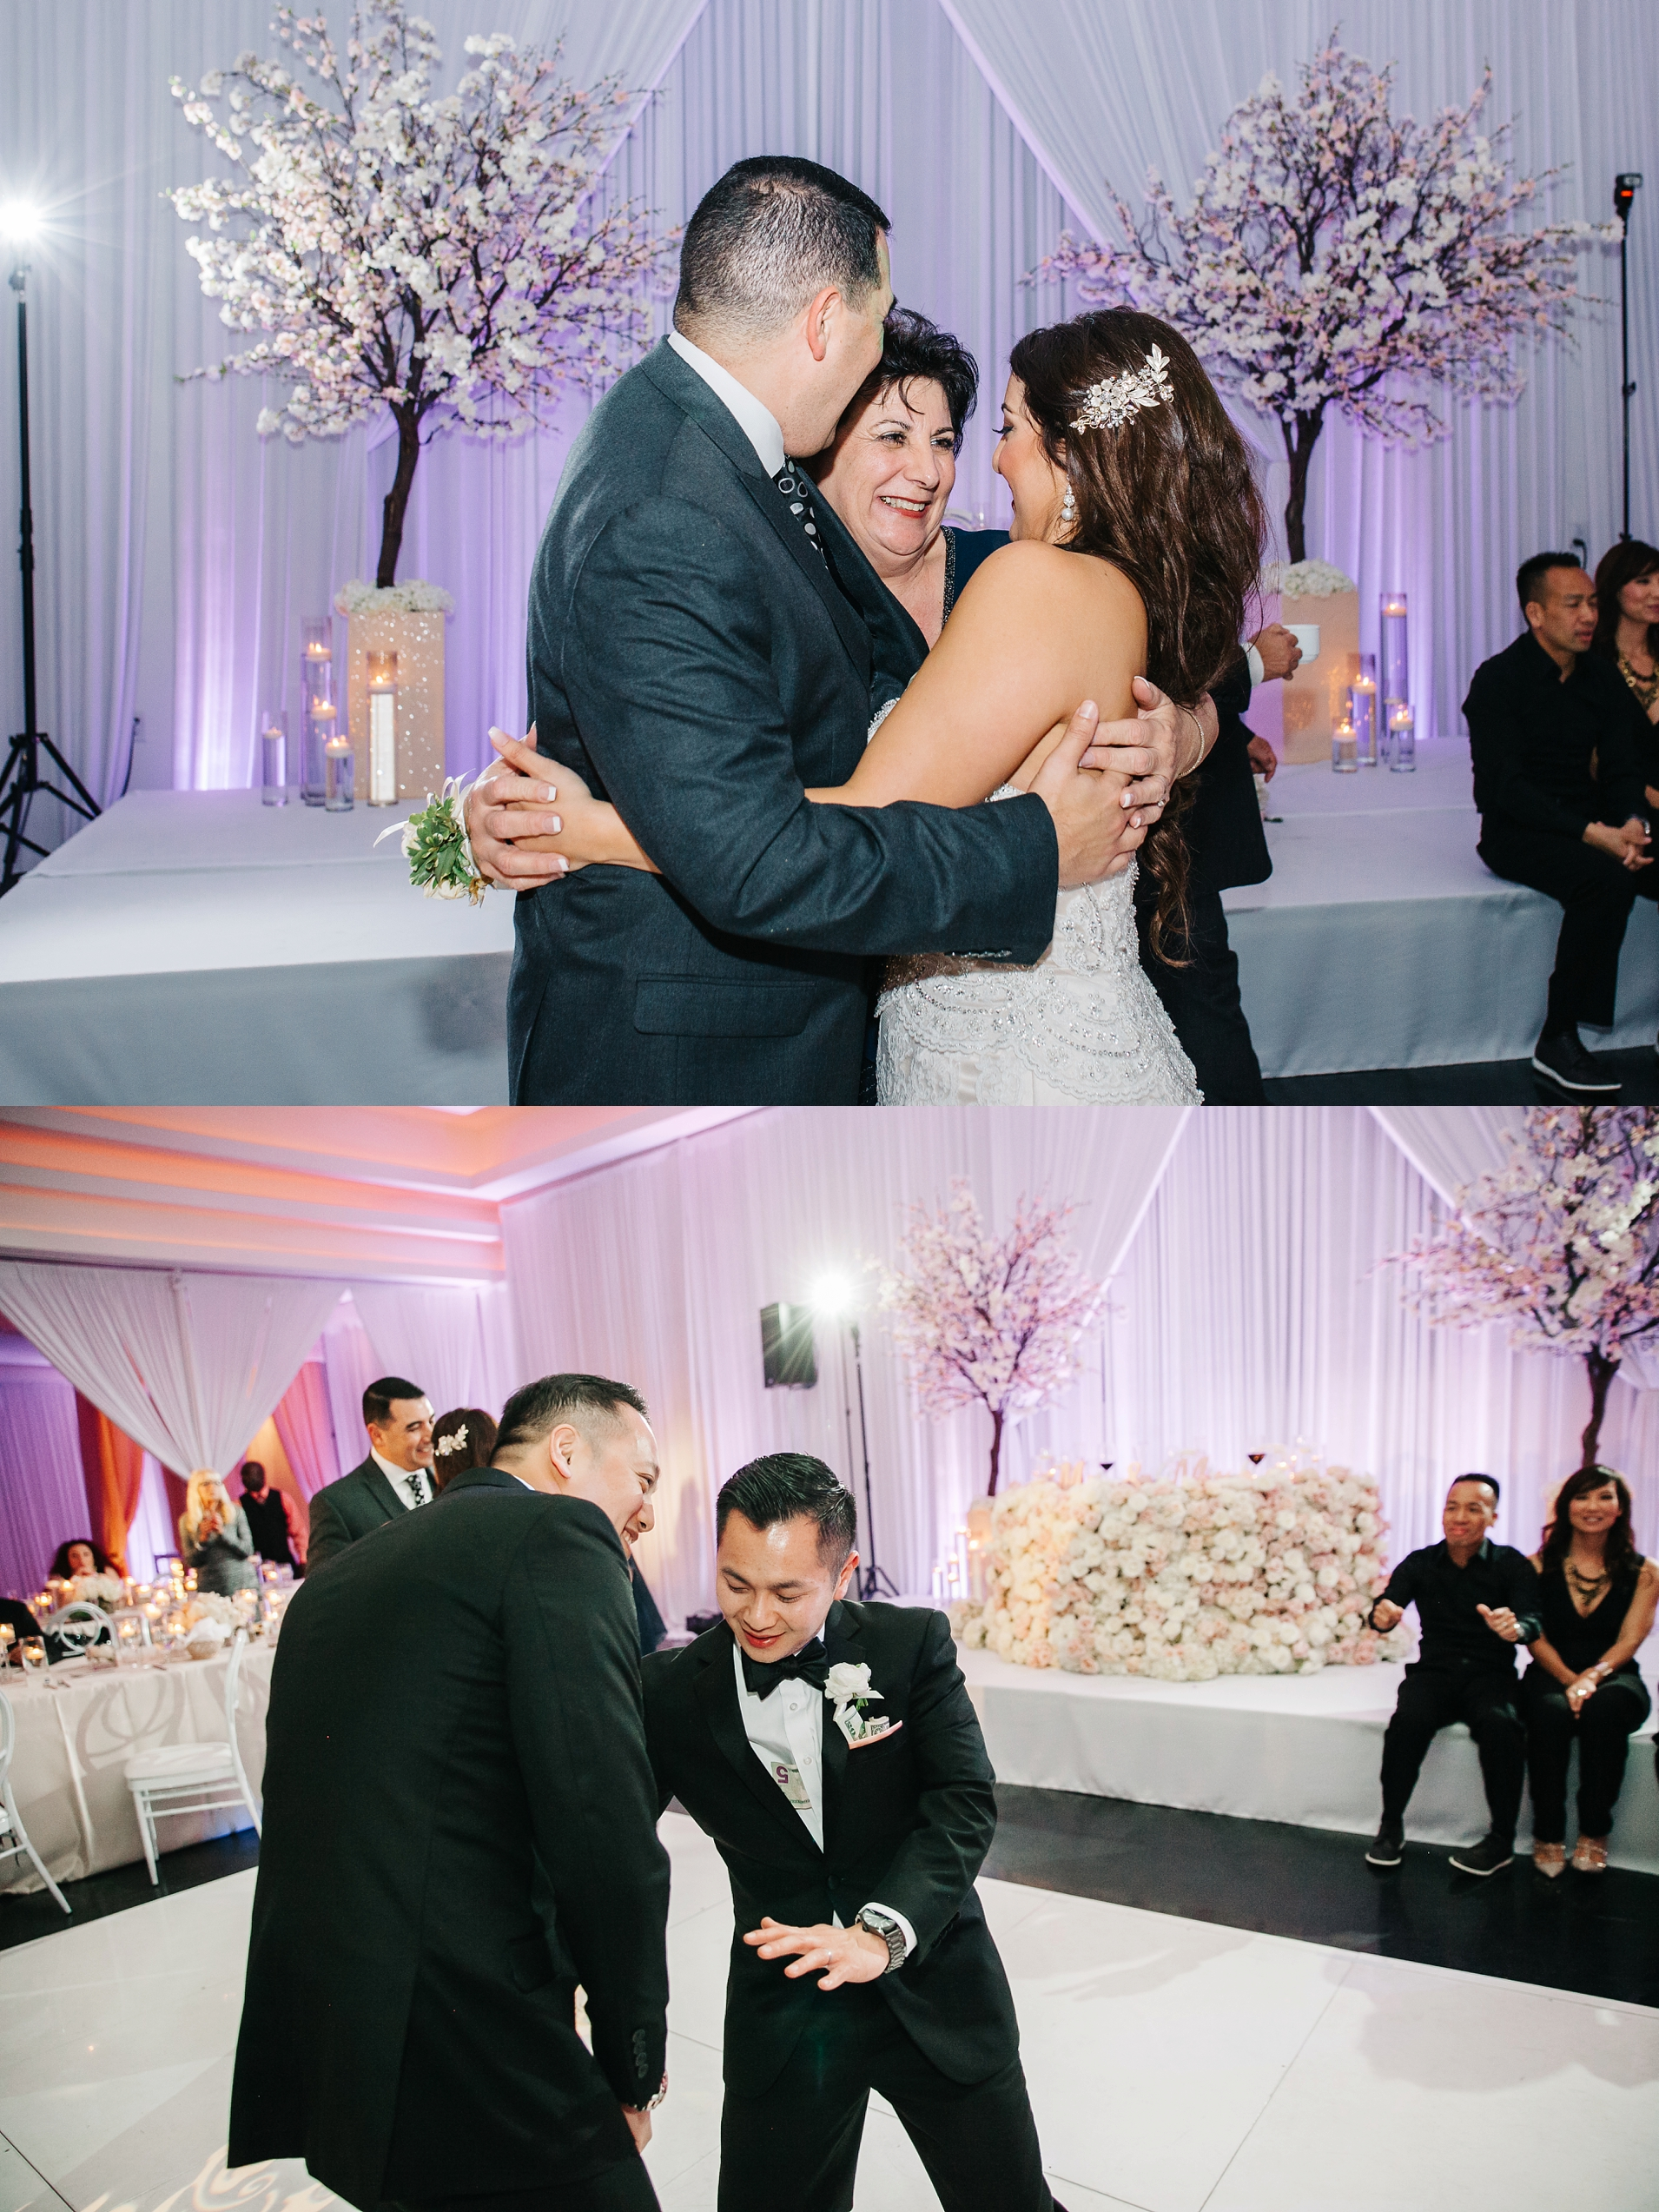 Wedding Reception by Brittney Hannon Photography at Venue by Three Petals Wedding in Huntington Beach, CA